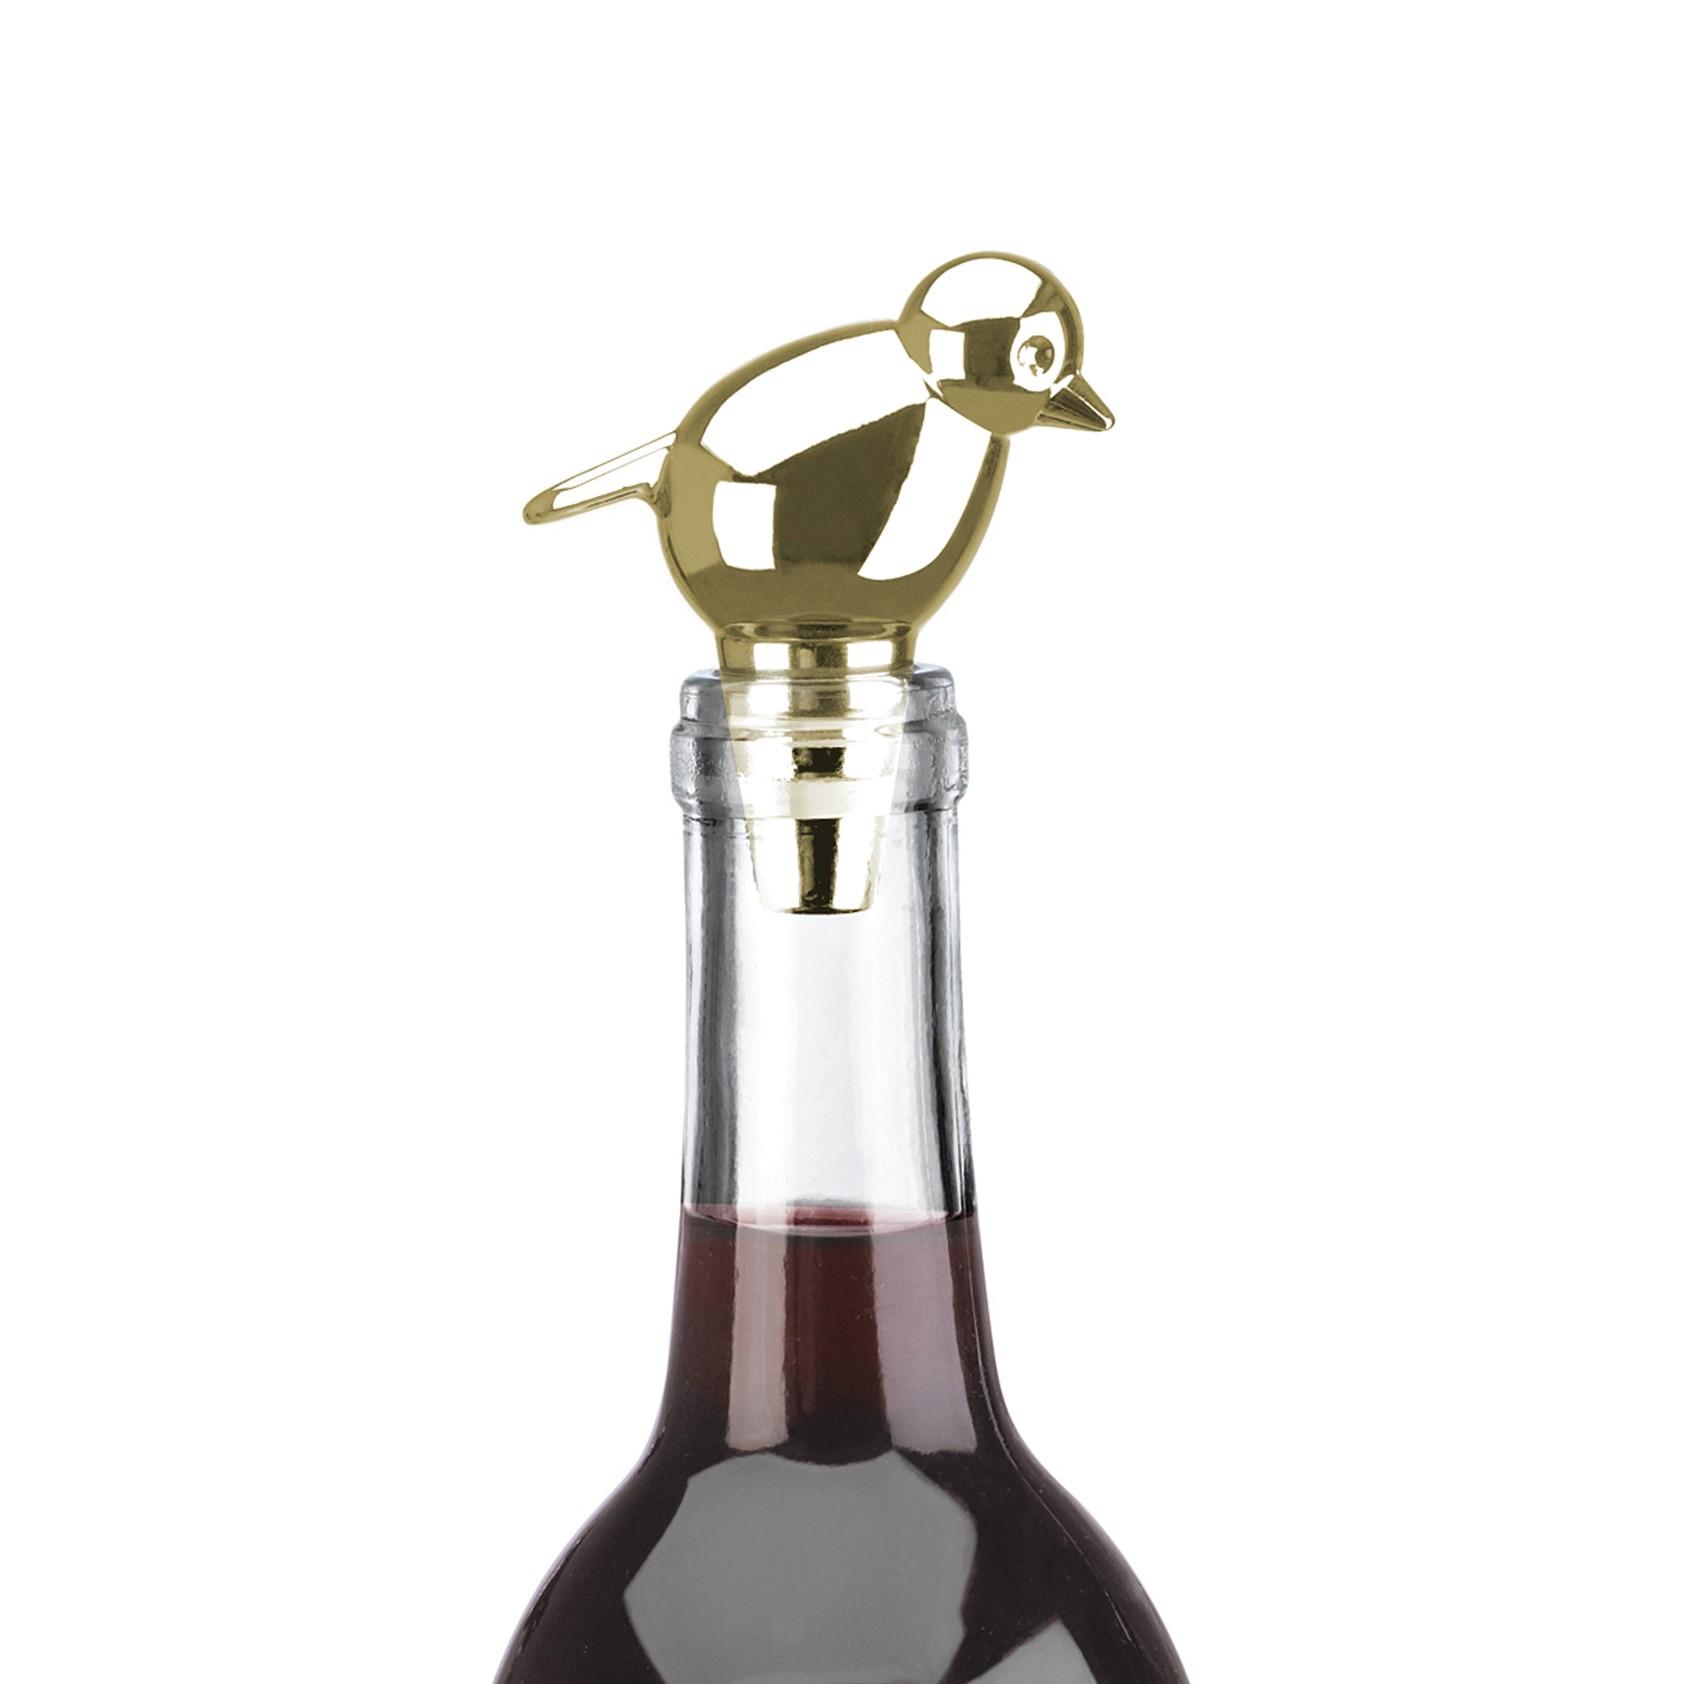 Пробка для бутылки Menagerie&Perch Птица